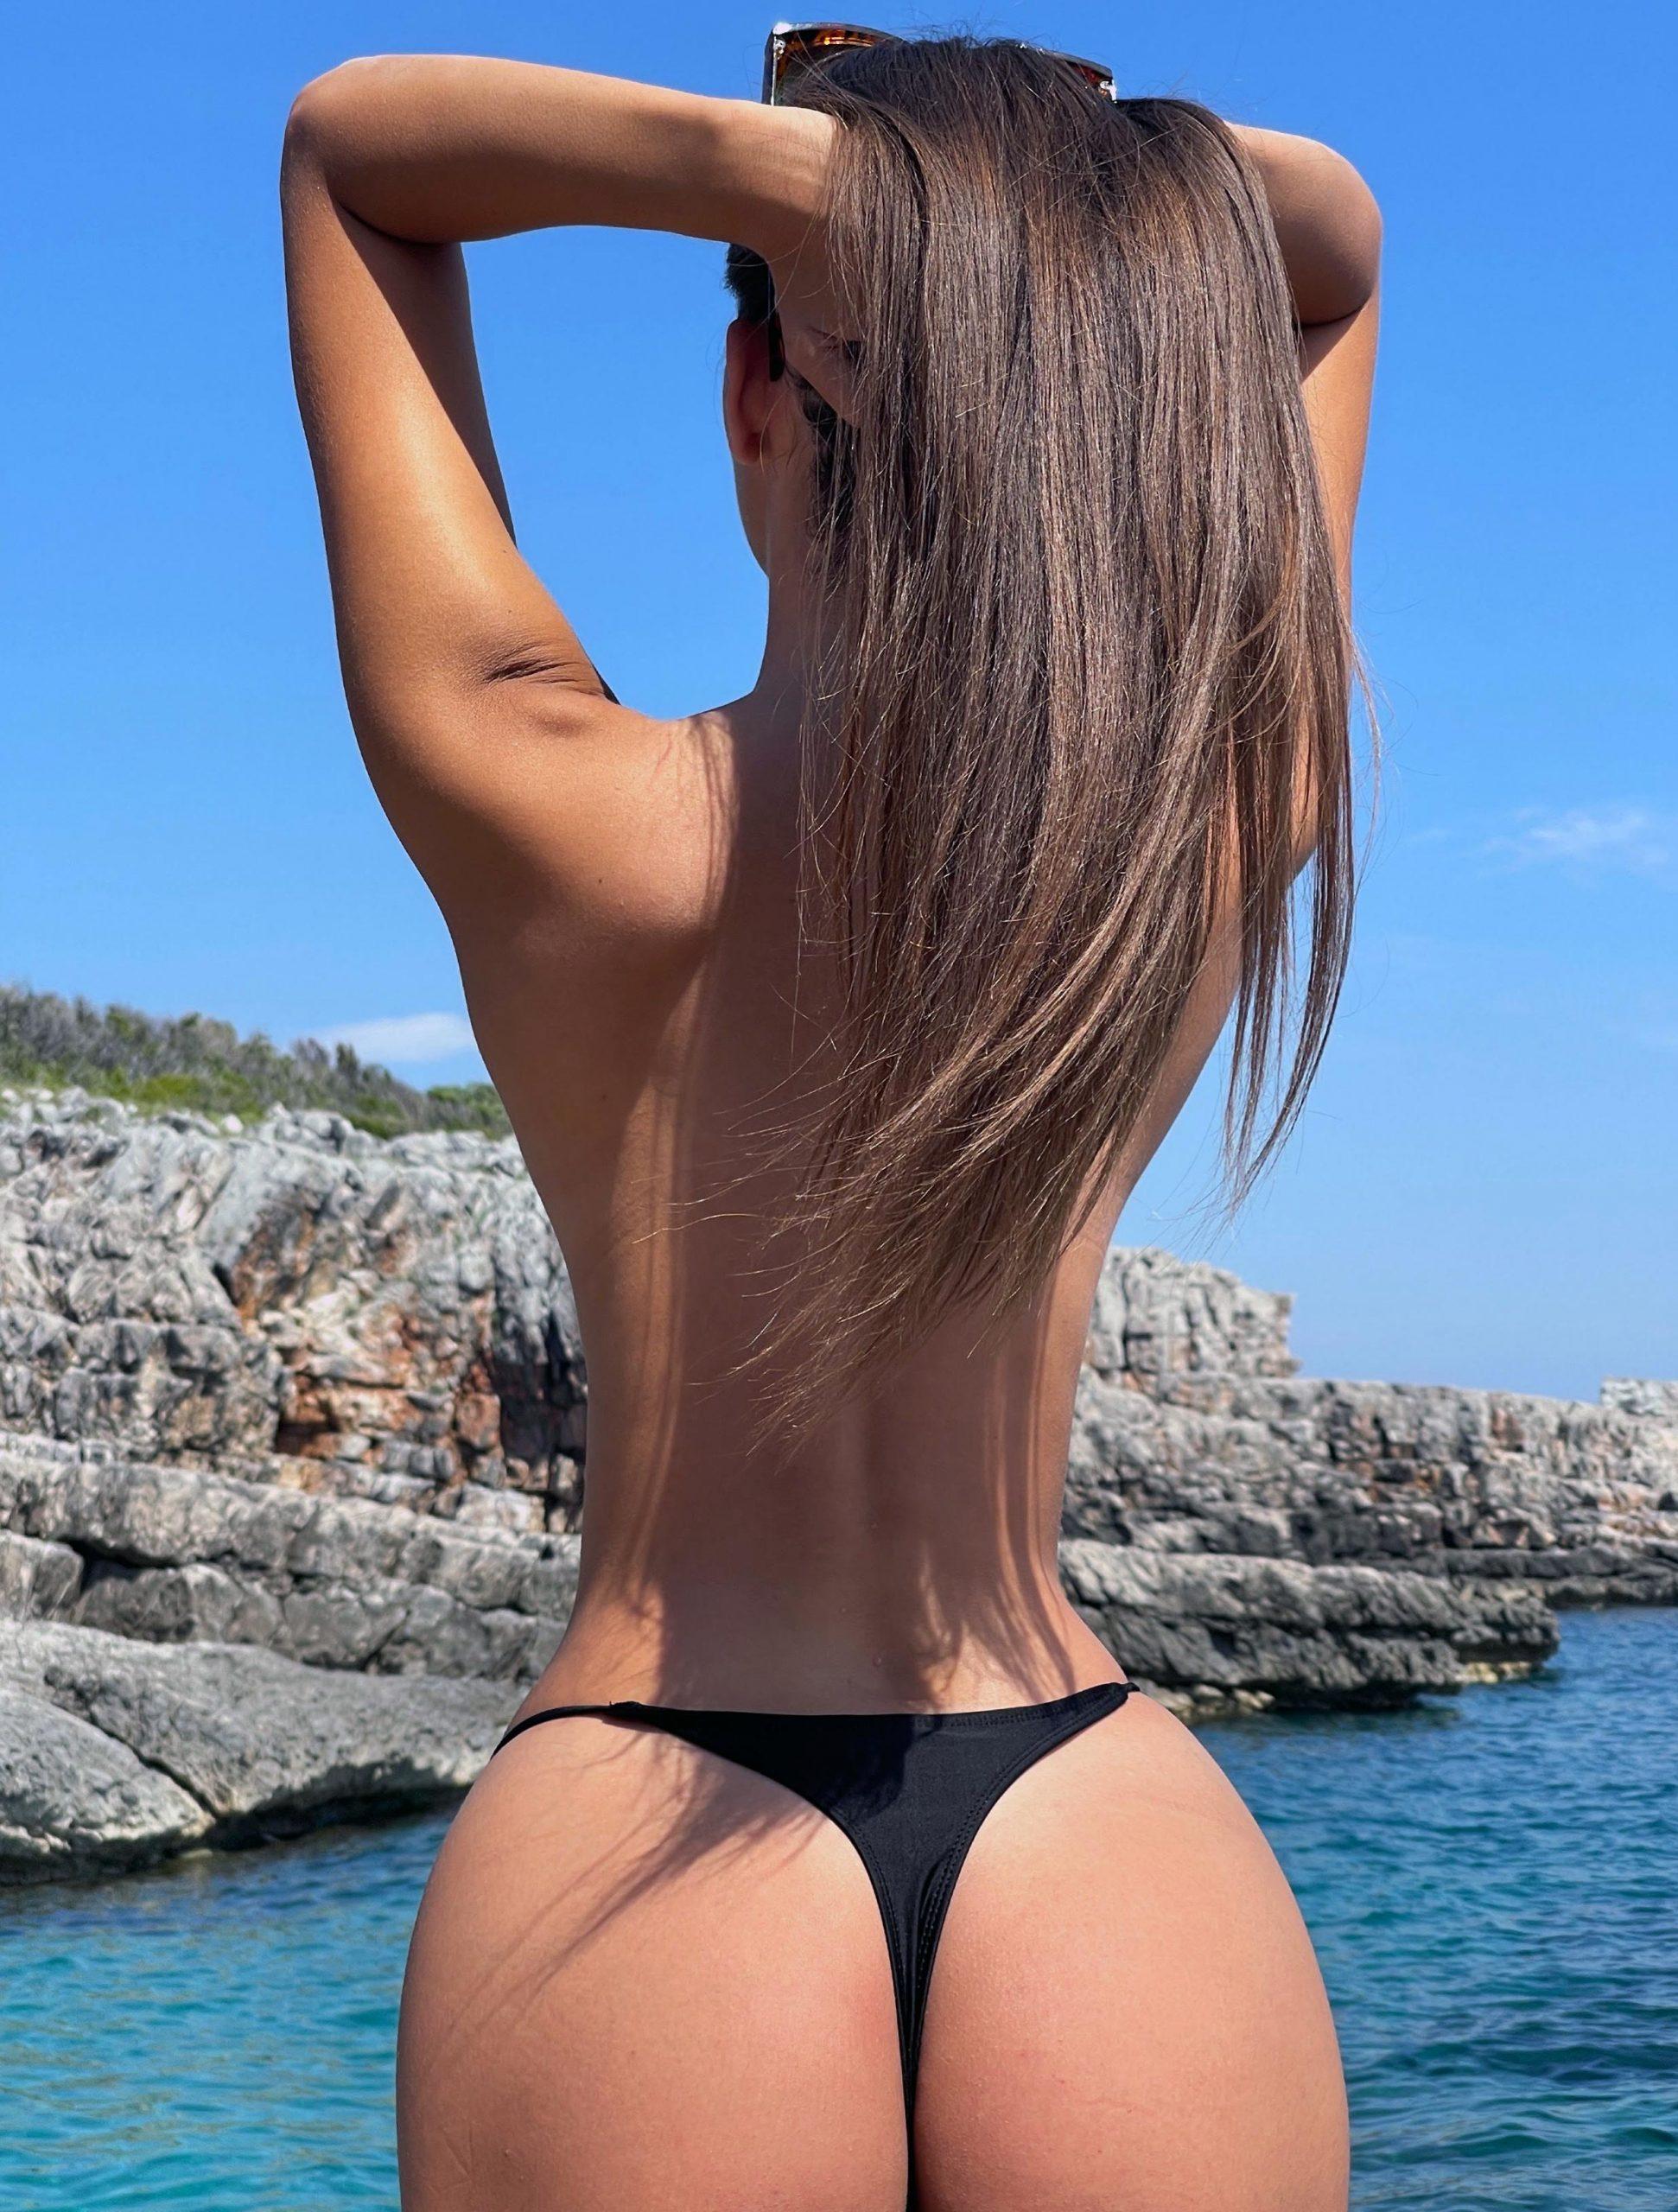 Porn pics bikini Bikini Porn